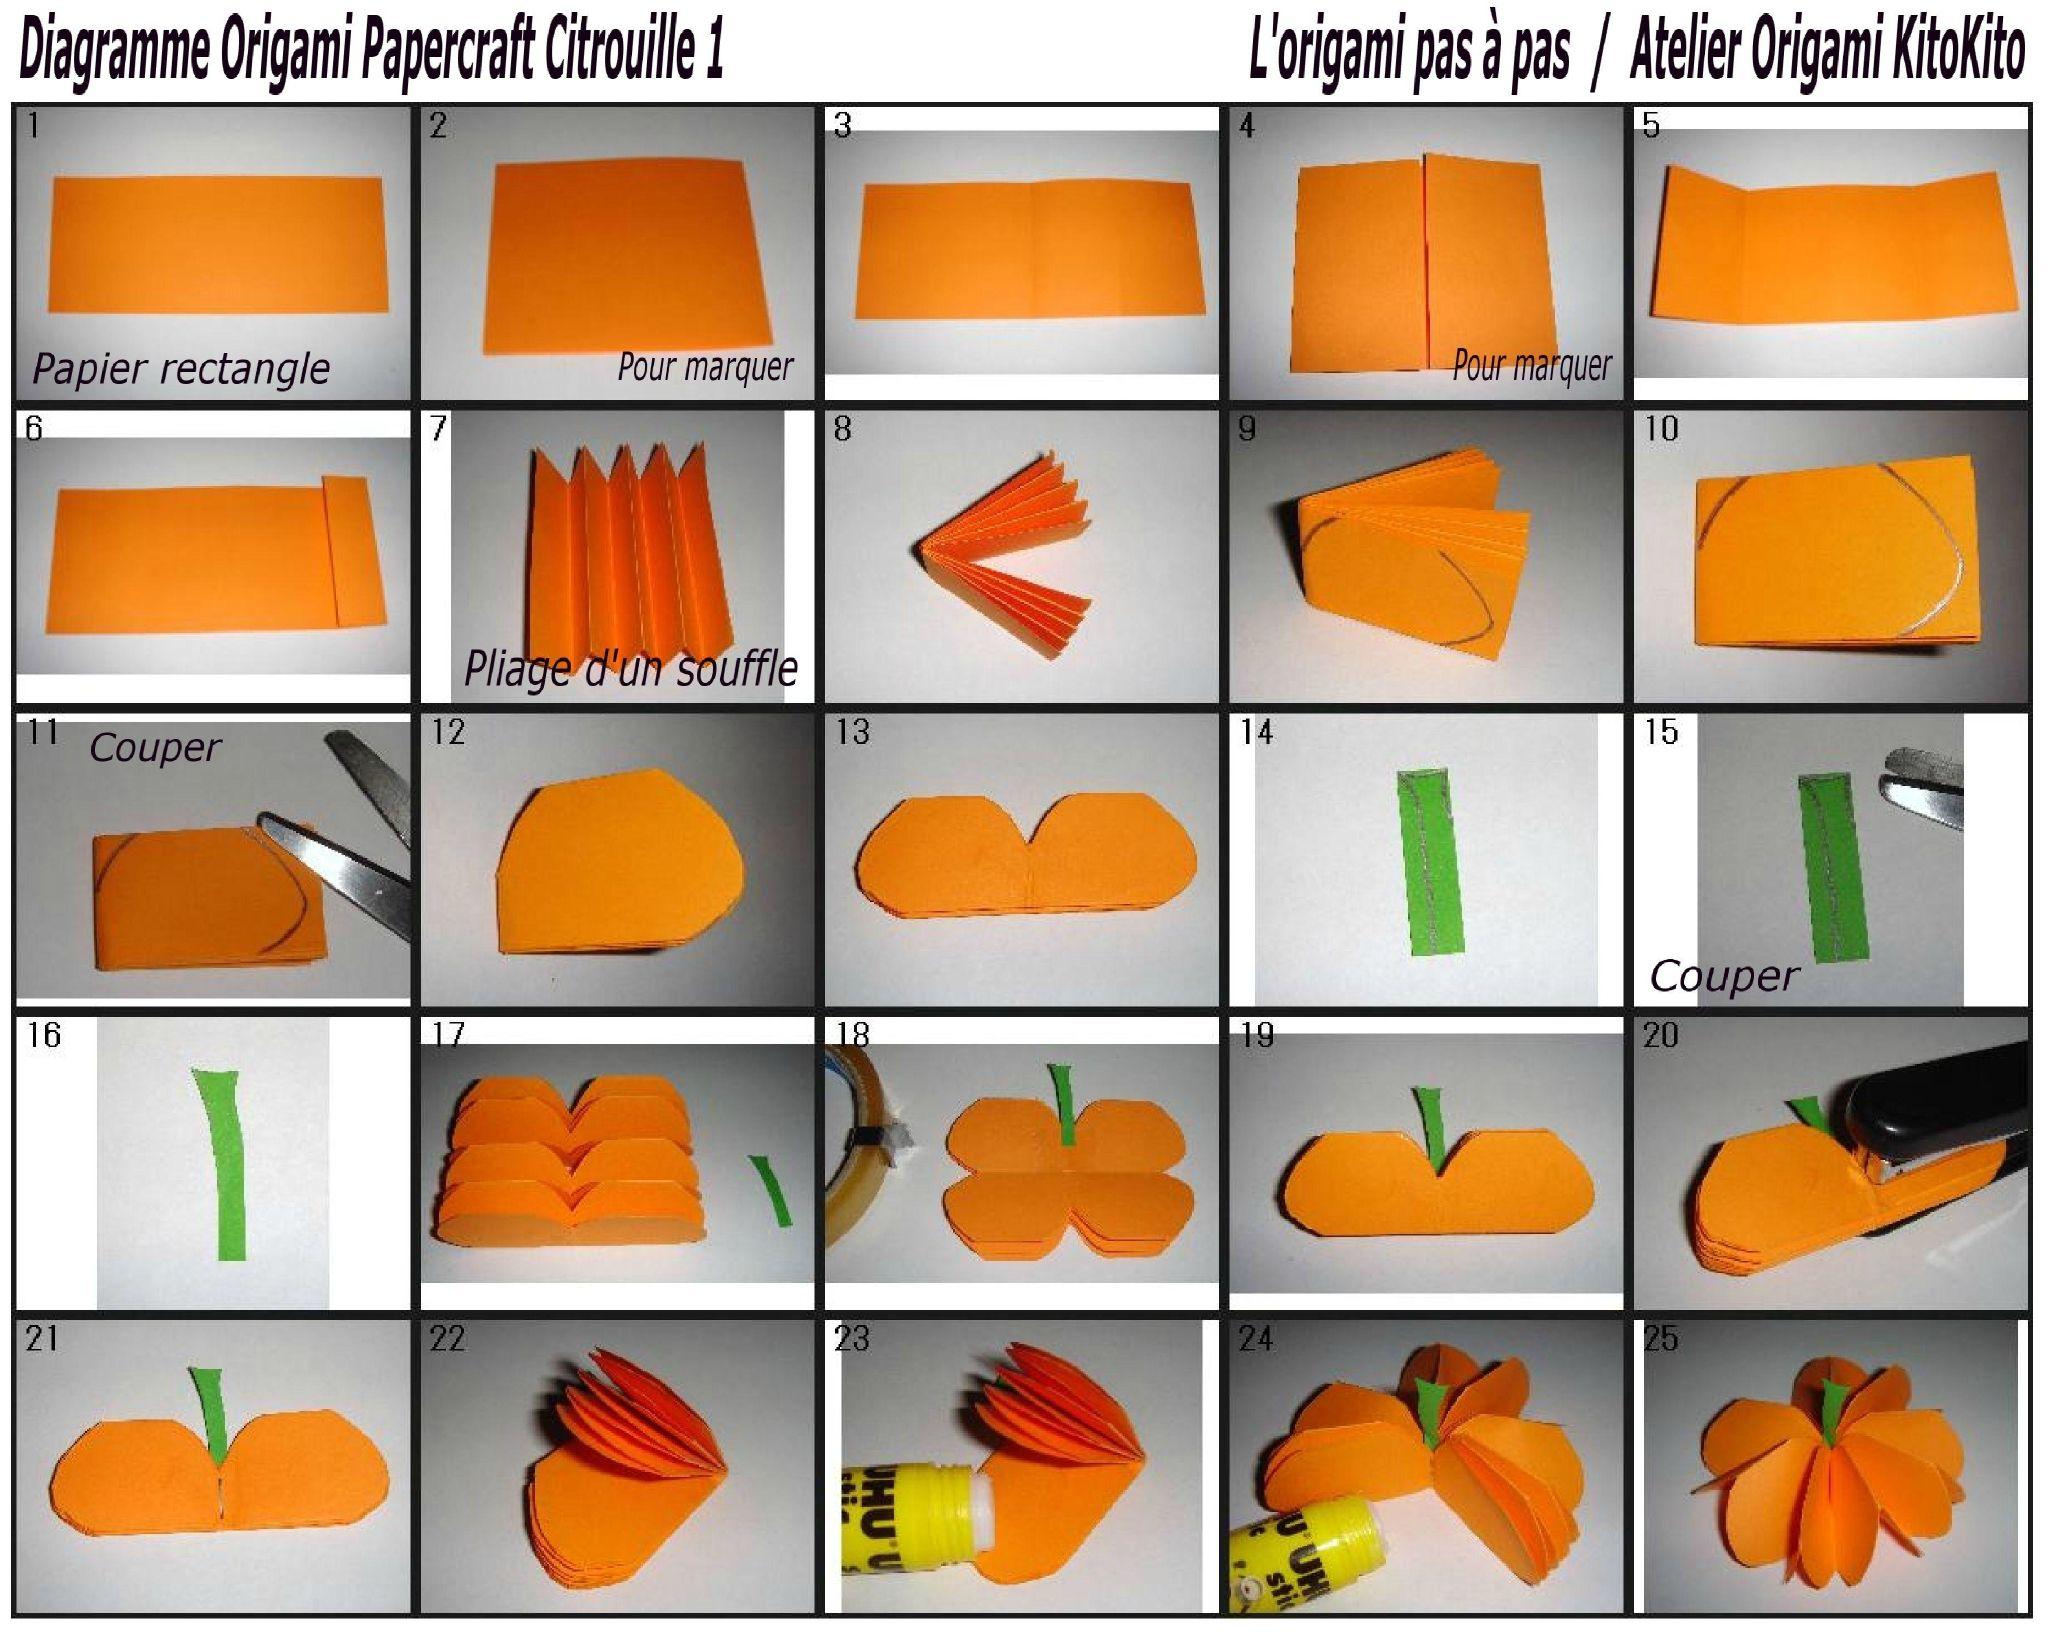 Origami Papercraft Citrouille 1 pour Papercraft